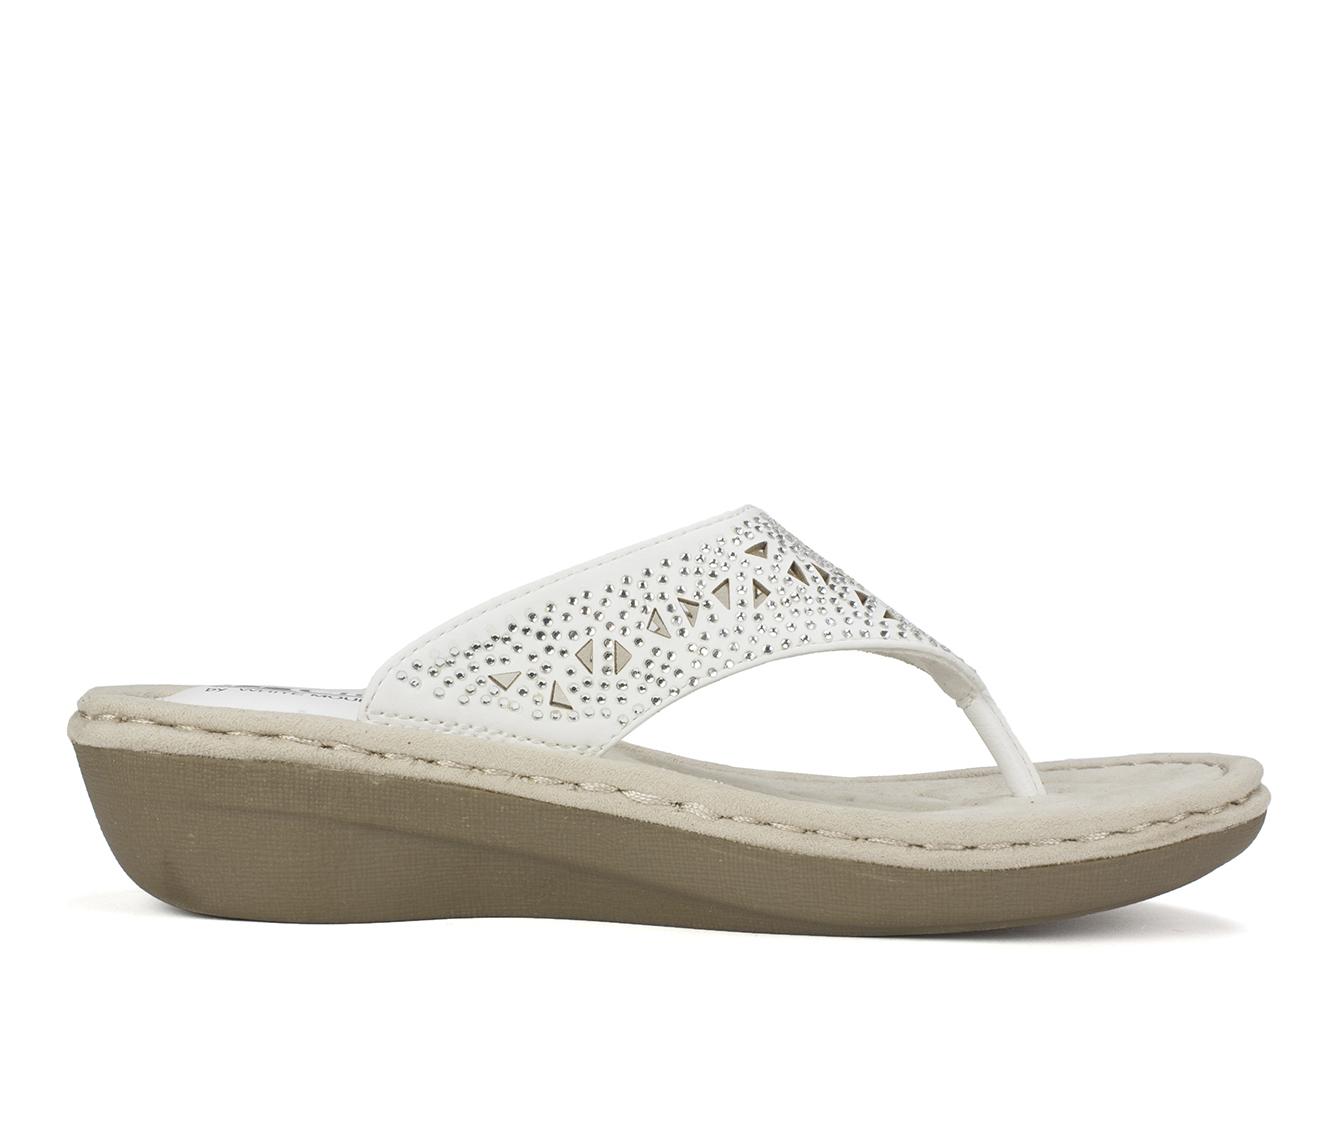 Cliffs Carlotta Women's Sandal (White Faux Leather)